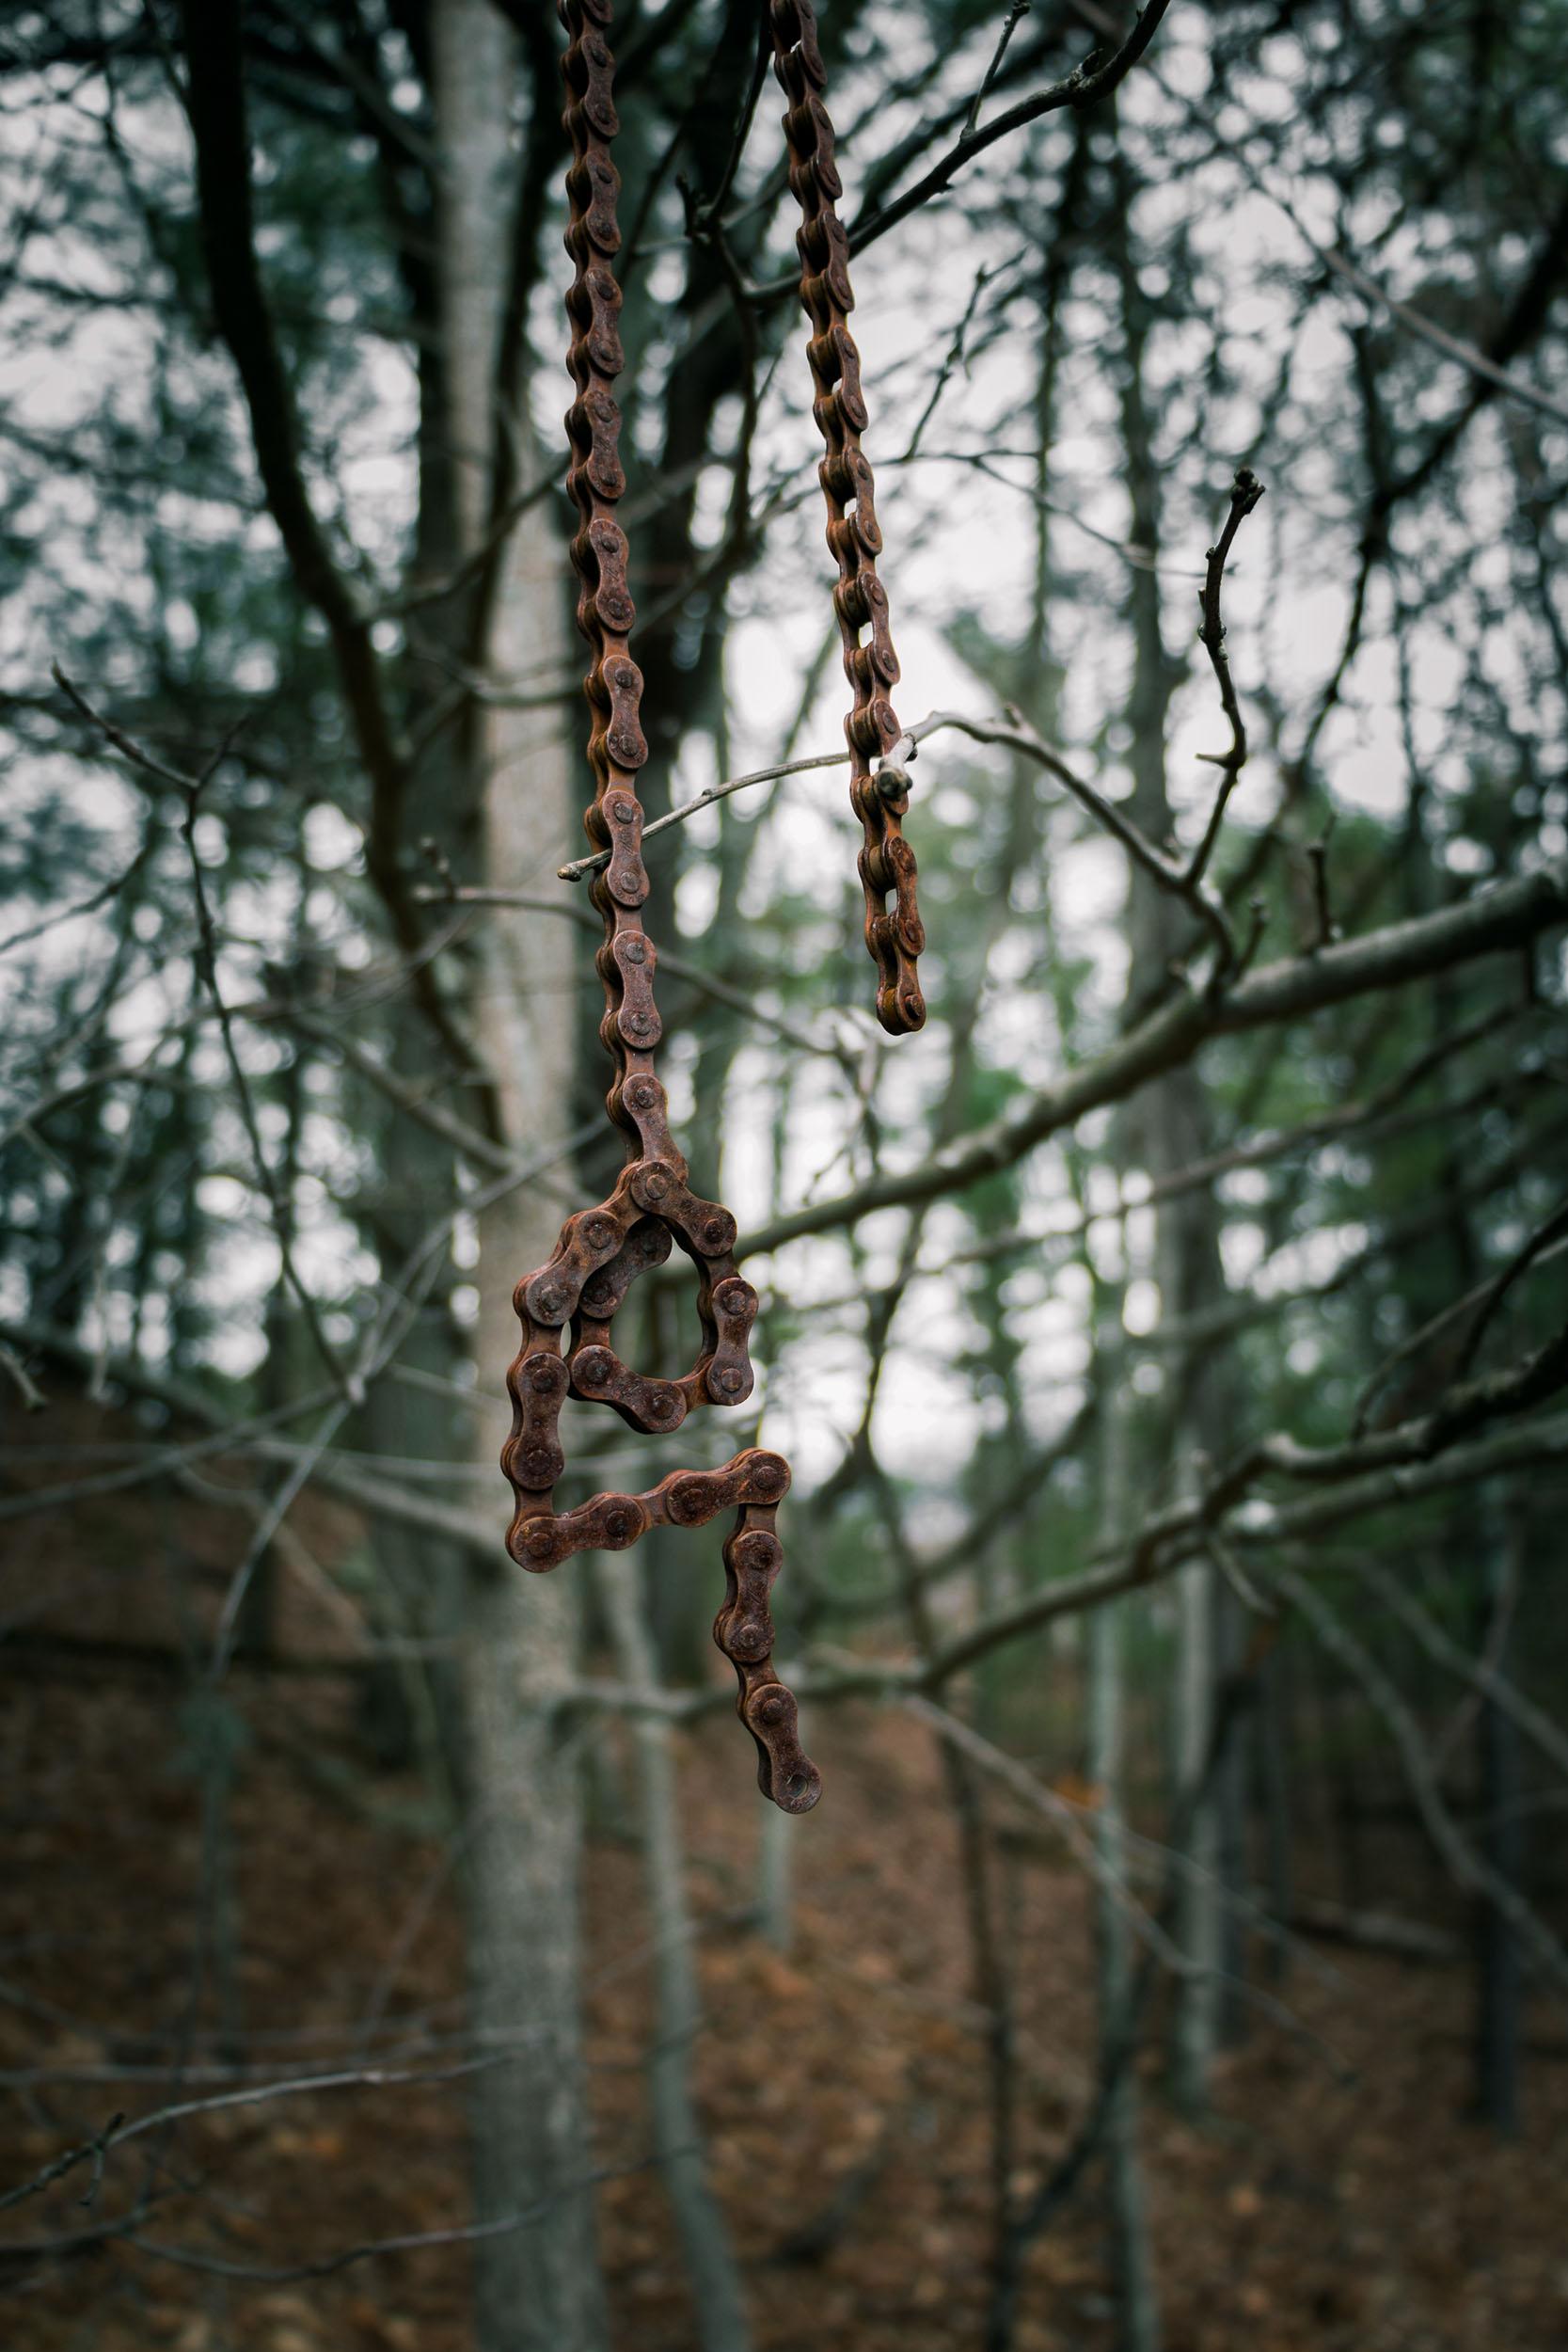 Matt Grandbois Photography — dramatic_chain